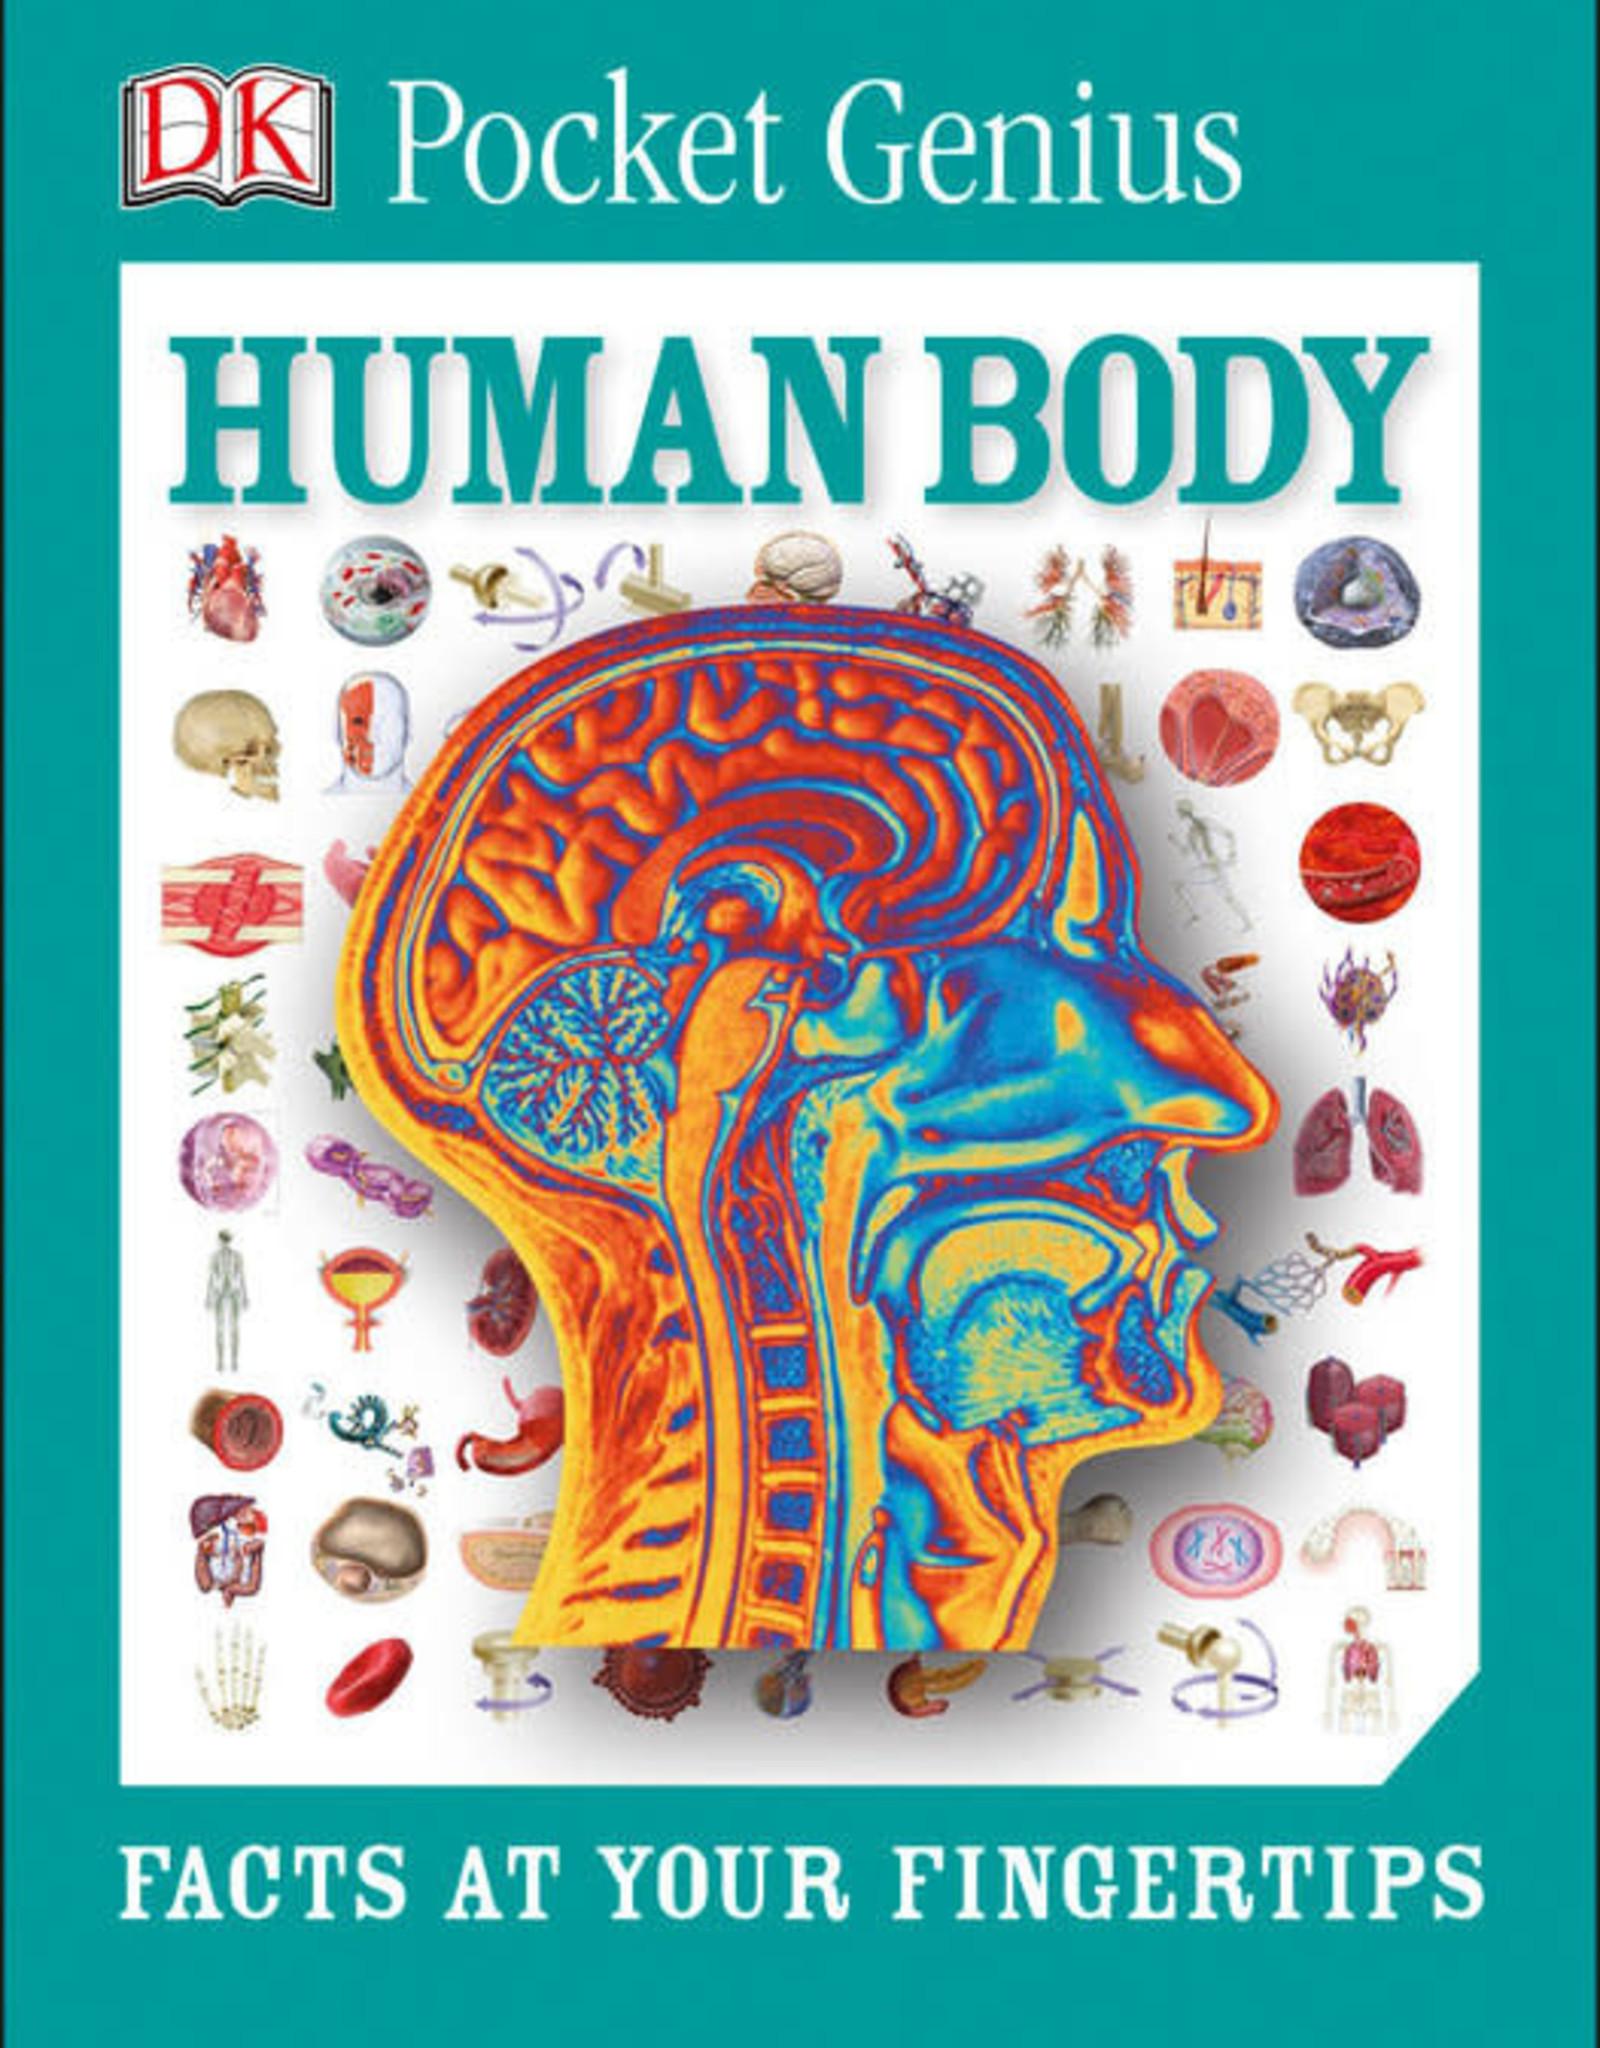 DK Pocket Genius Human Body